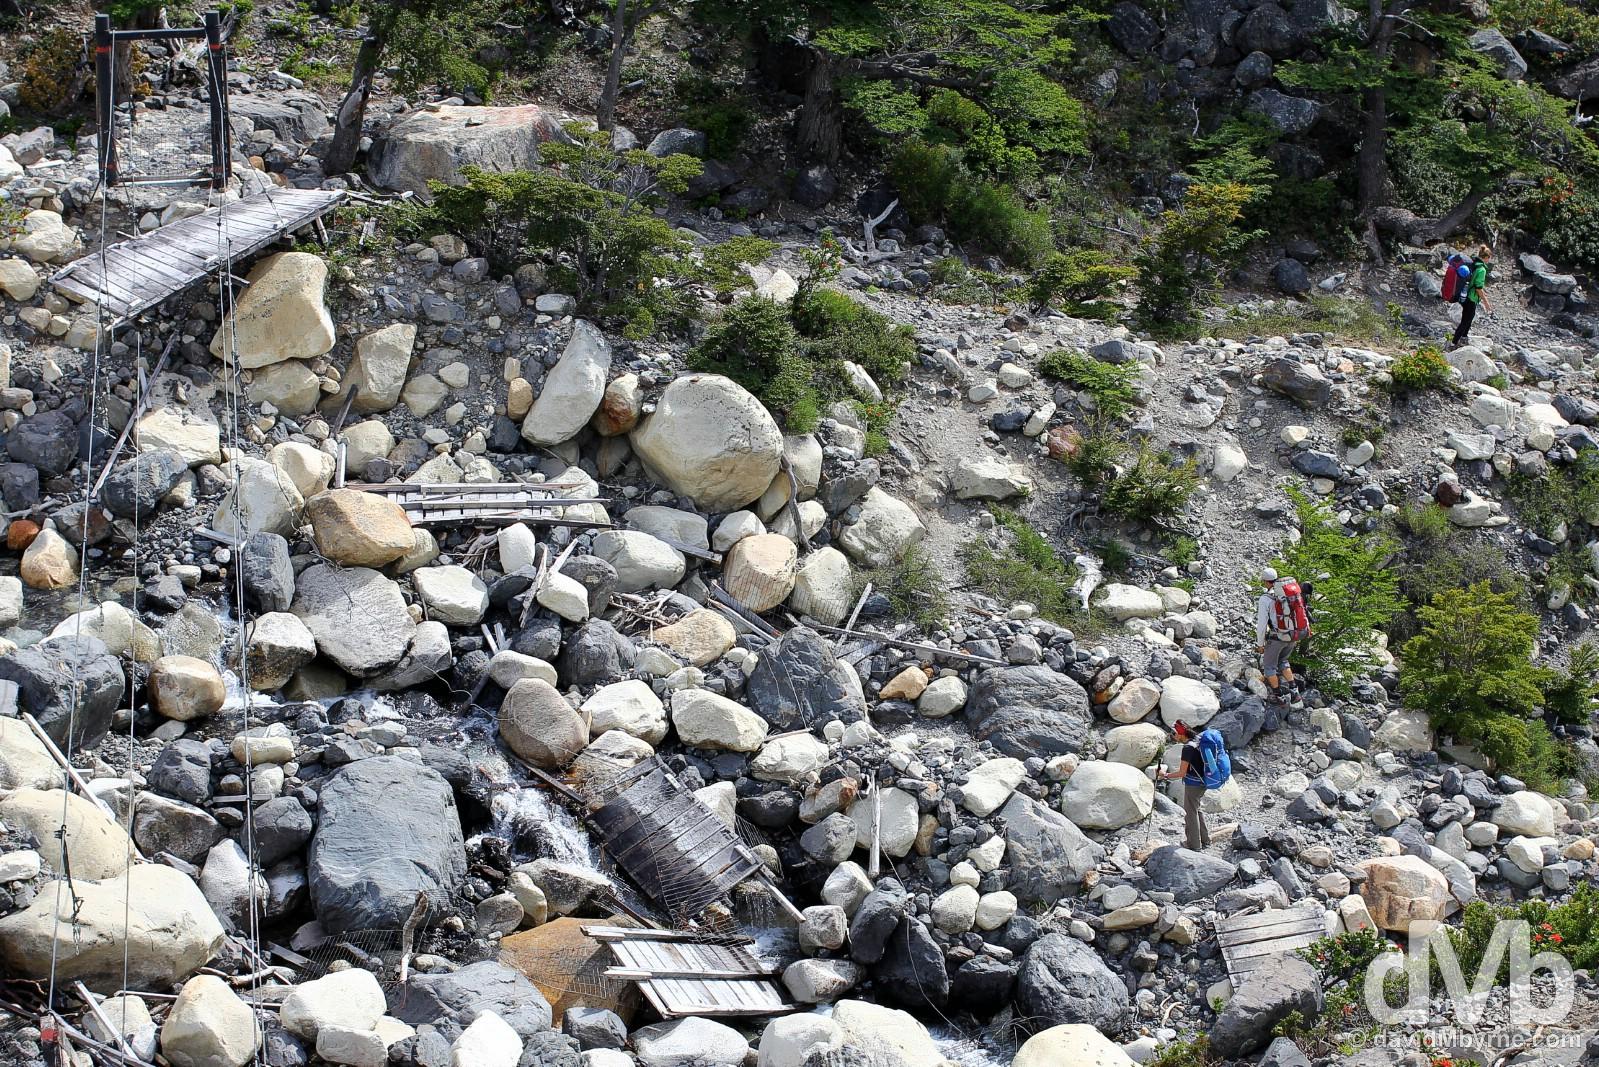 A broken bridge in Torres del Paine National Park, Chile. November 23, 2015.